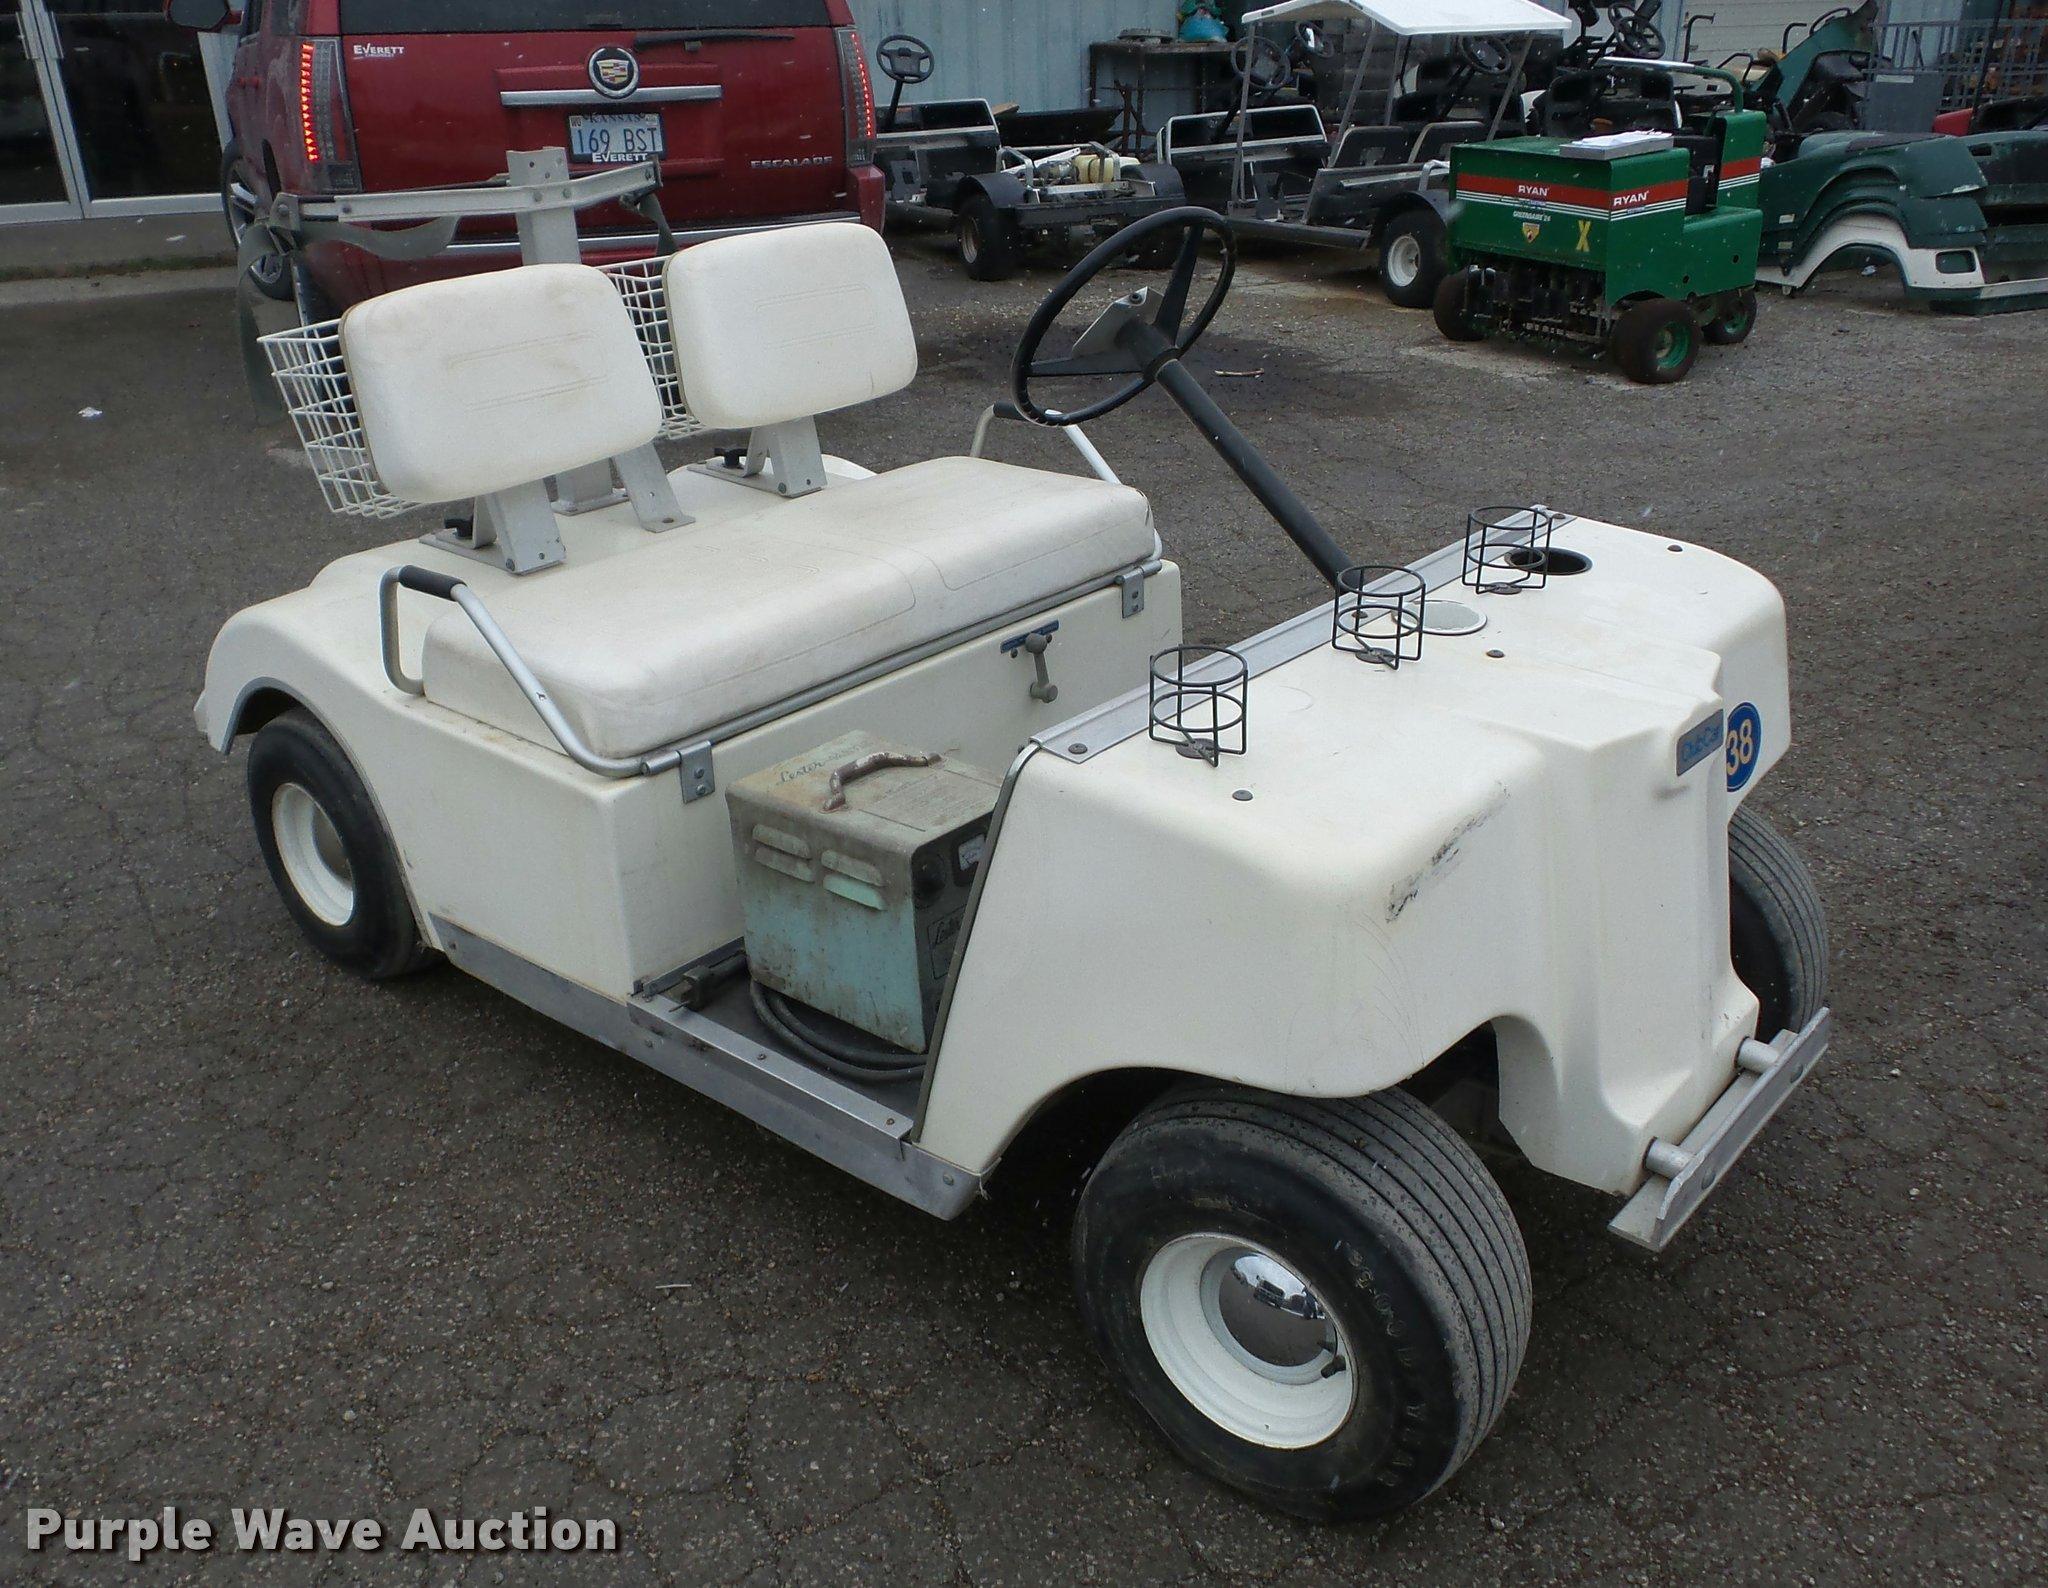 1979 Club Car golf cart   Item AG9018   SOLD! April 12 Vehic... Golf Cart Full Car on golf cart best, golf cart california, golf cart hand, golf cart head, golf cart back, golf cart movie, golf cart large, golf cart red, golf cart front, golf cart game, golf cart step, golf cart fast, golf cart real, golf cart modified, golf cart one, golf cart family, golf cart face, golf cart girl, golf cart light, golf cart king,